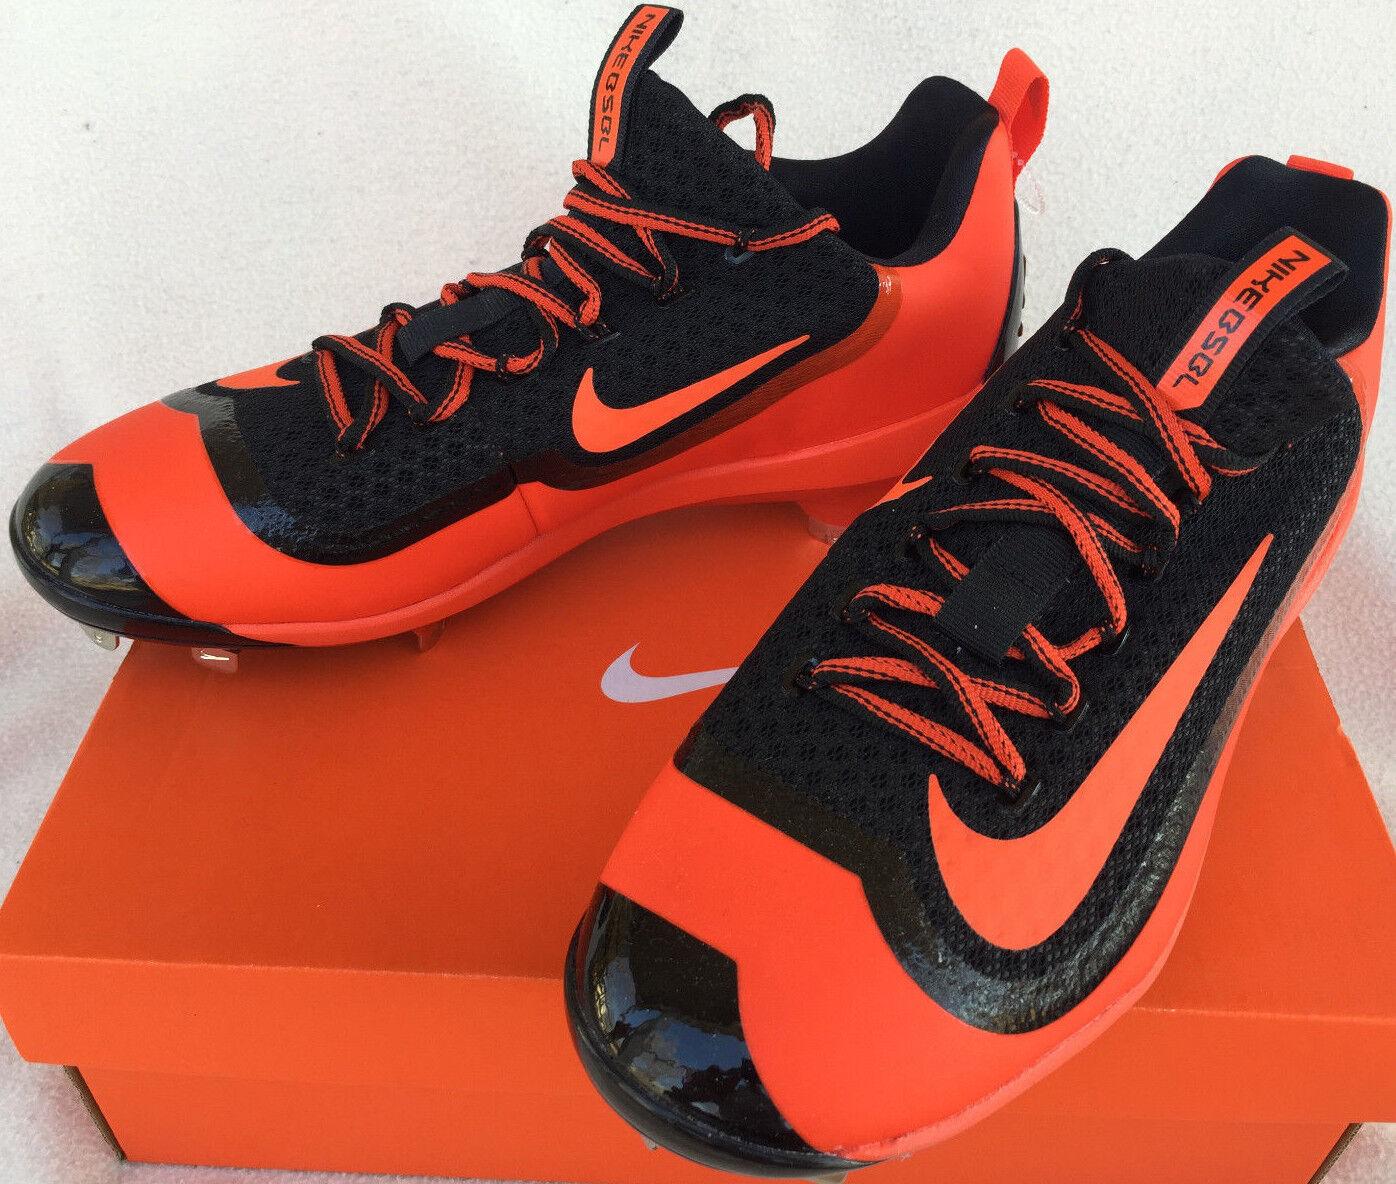 Nike Air Max Huarache BSBL 819137-080 Metal Baseball Cleats shoes Men's 8.5 MLB